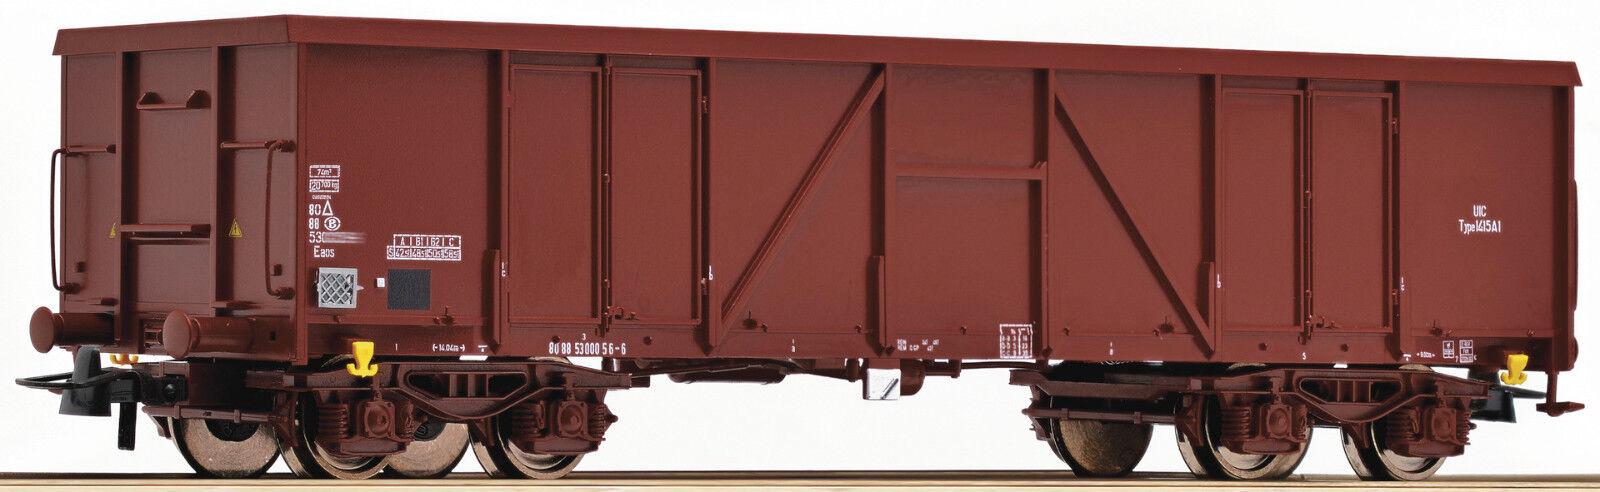 Roco H0 76720 /_ SNCB /_  offener Güterwagen Bauart Eaos /_ Ep IV /_/_ NEU